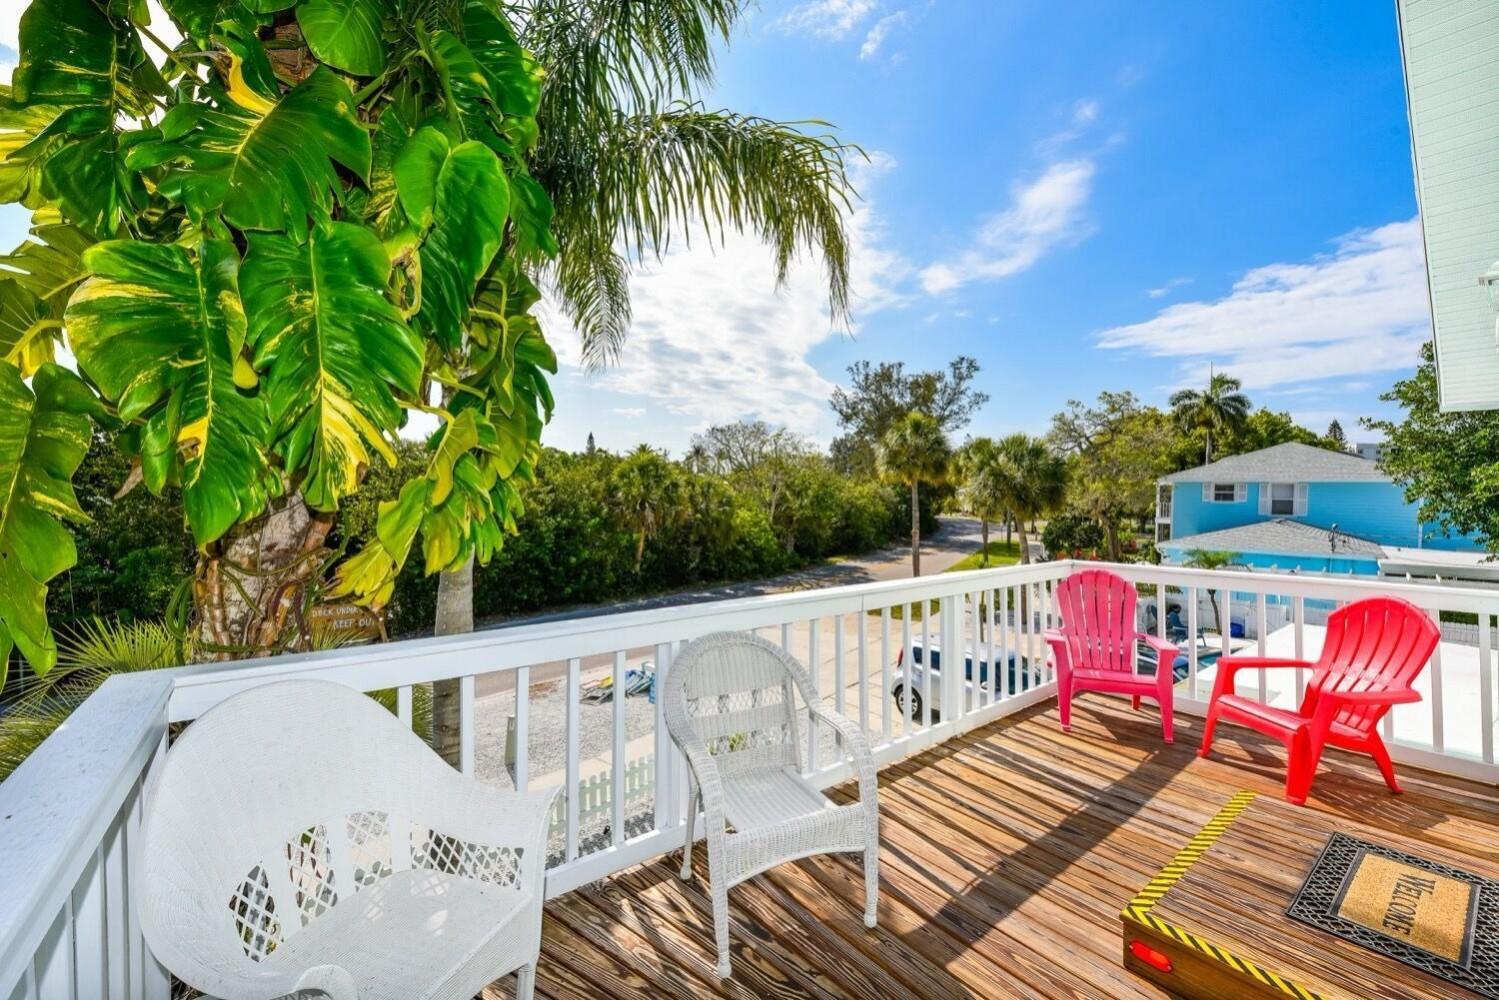 Island - Siesta Key Vacation Rentals